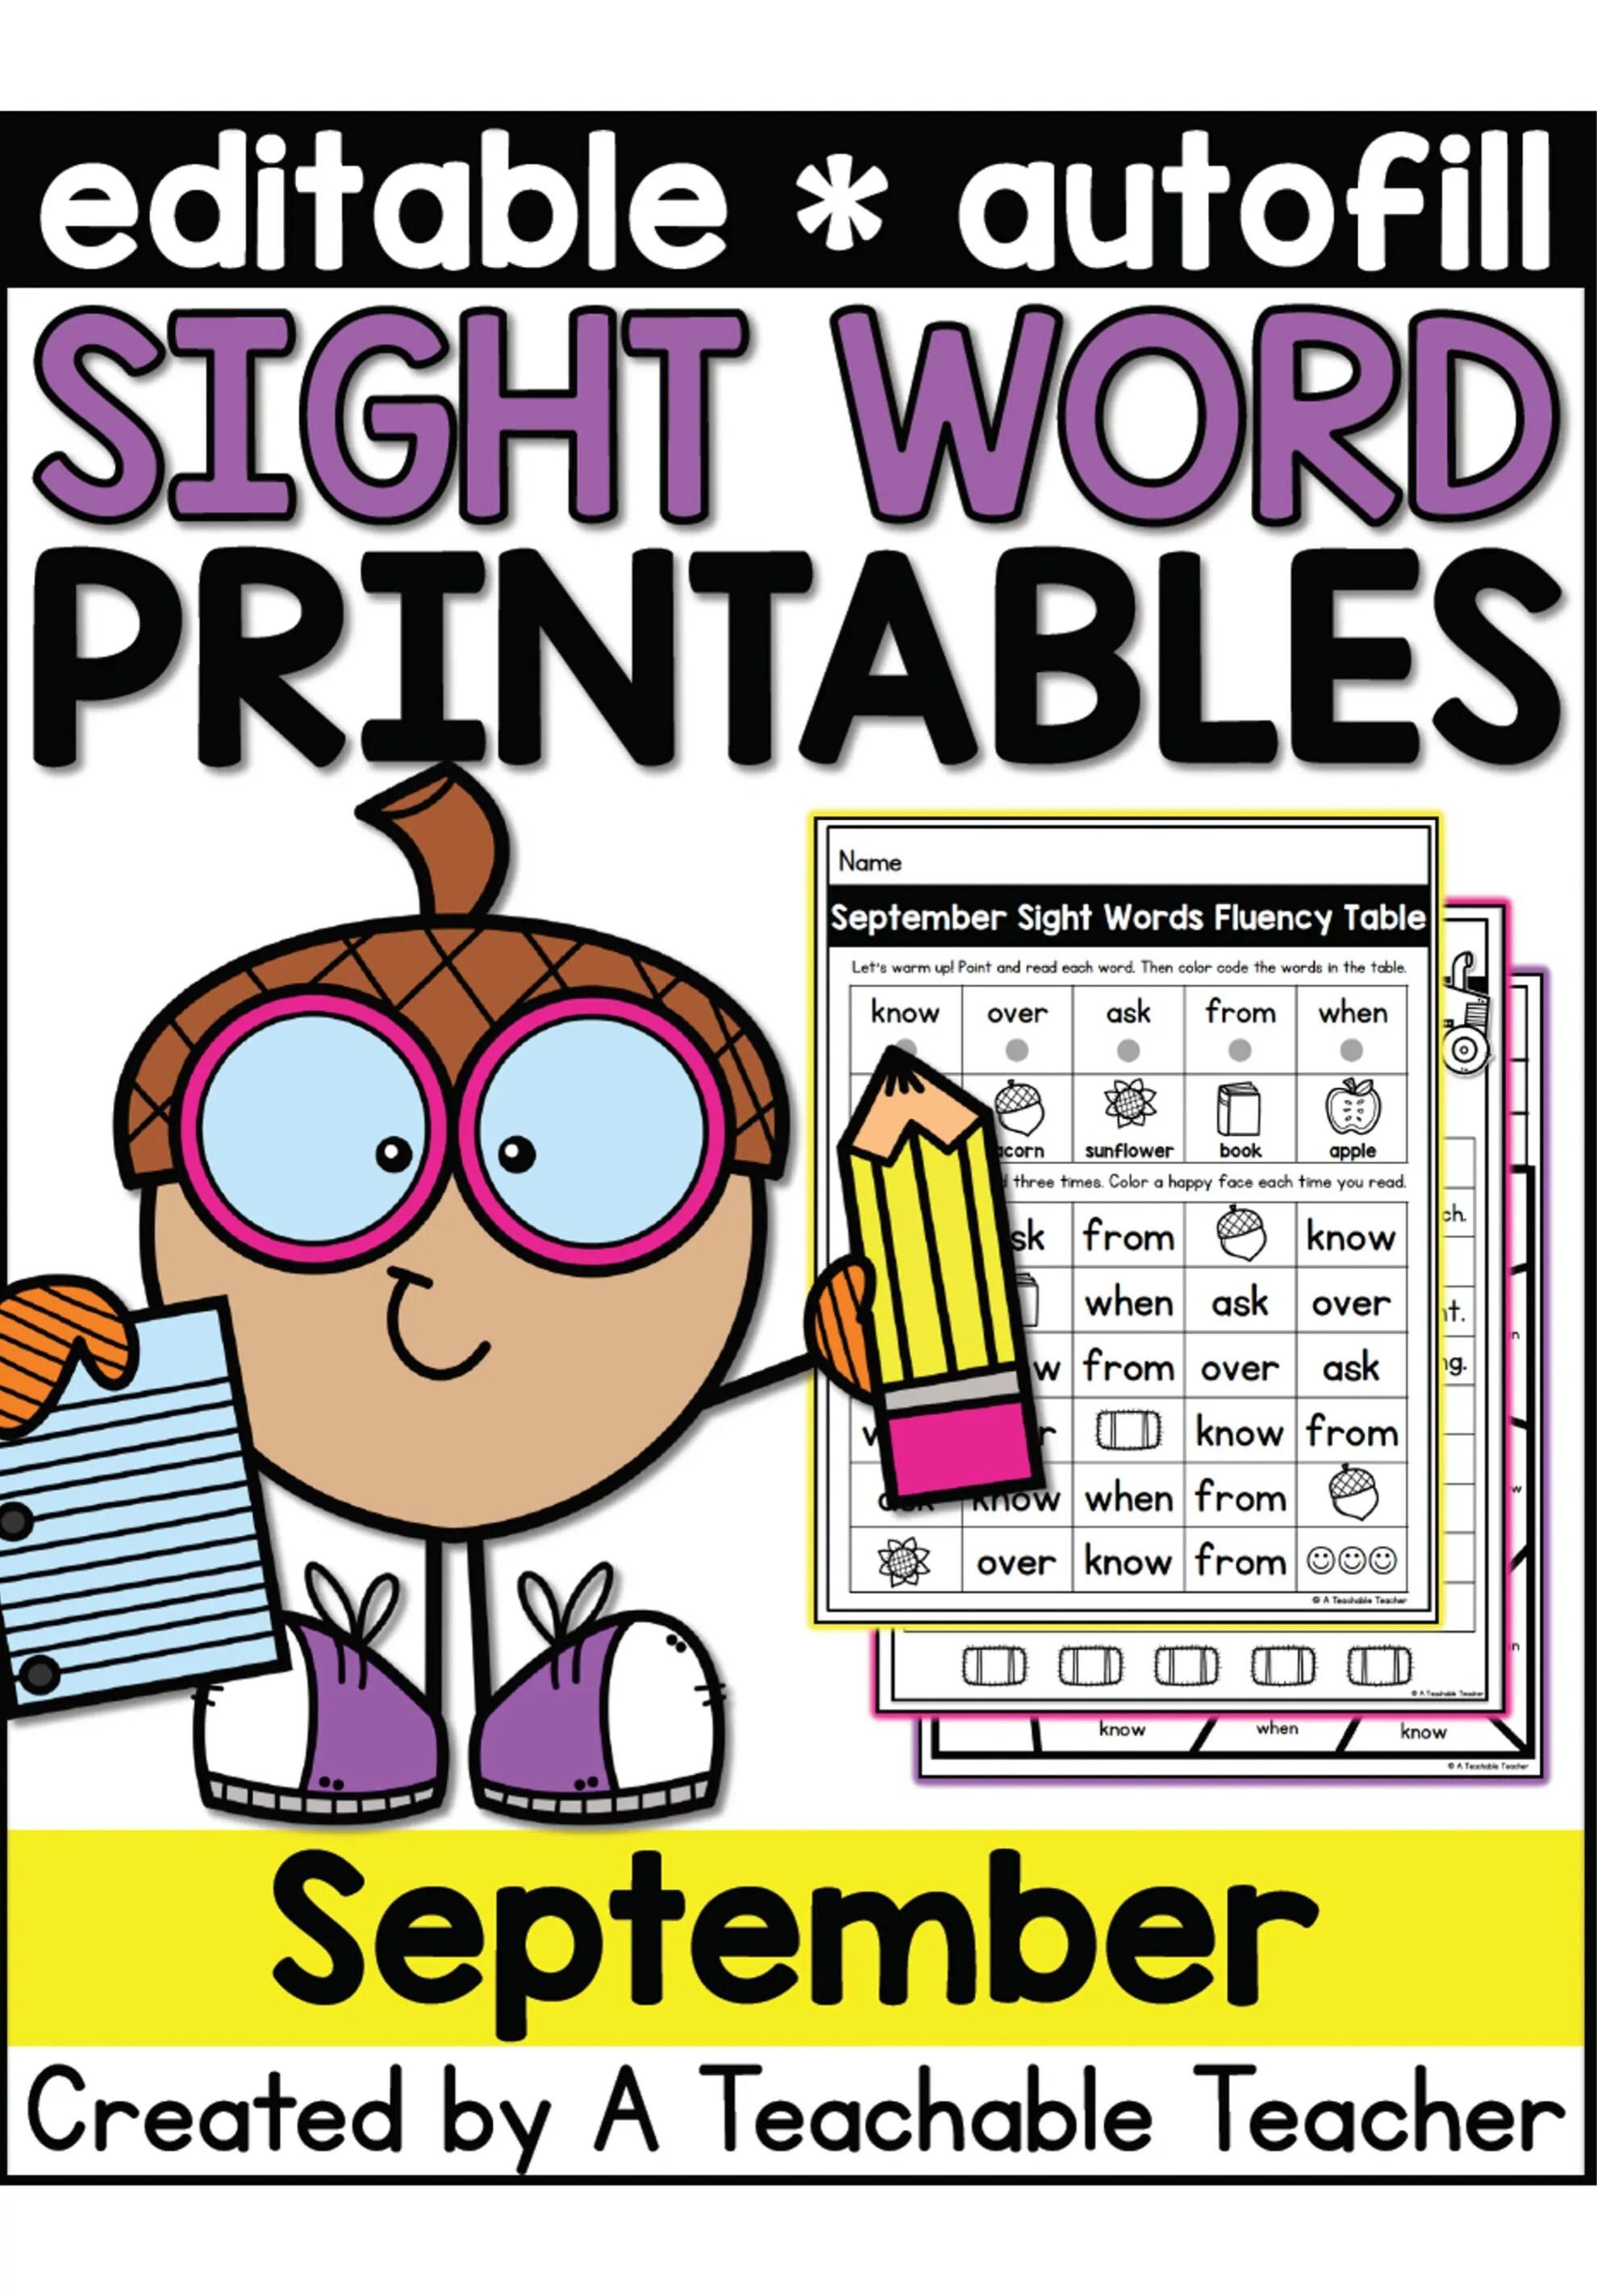 Editable Sight Word Printables September